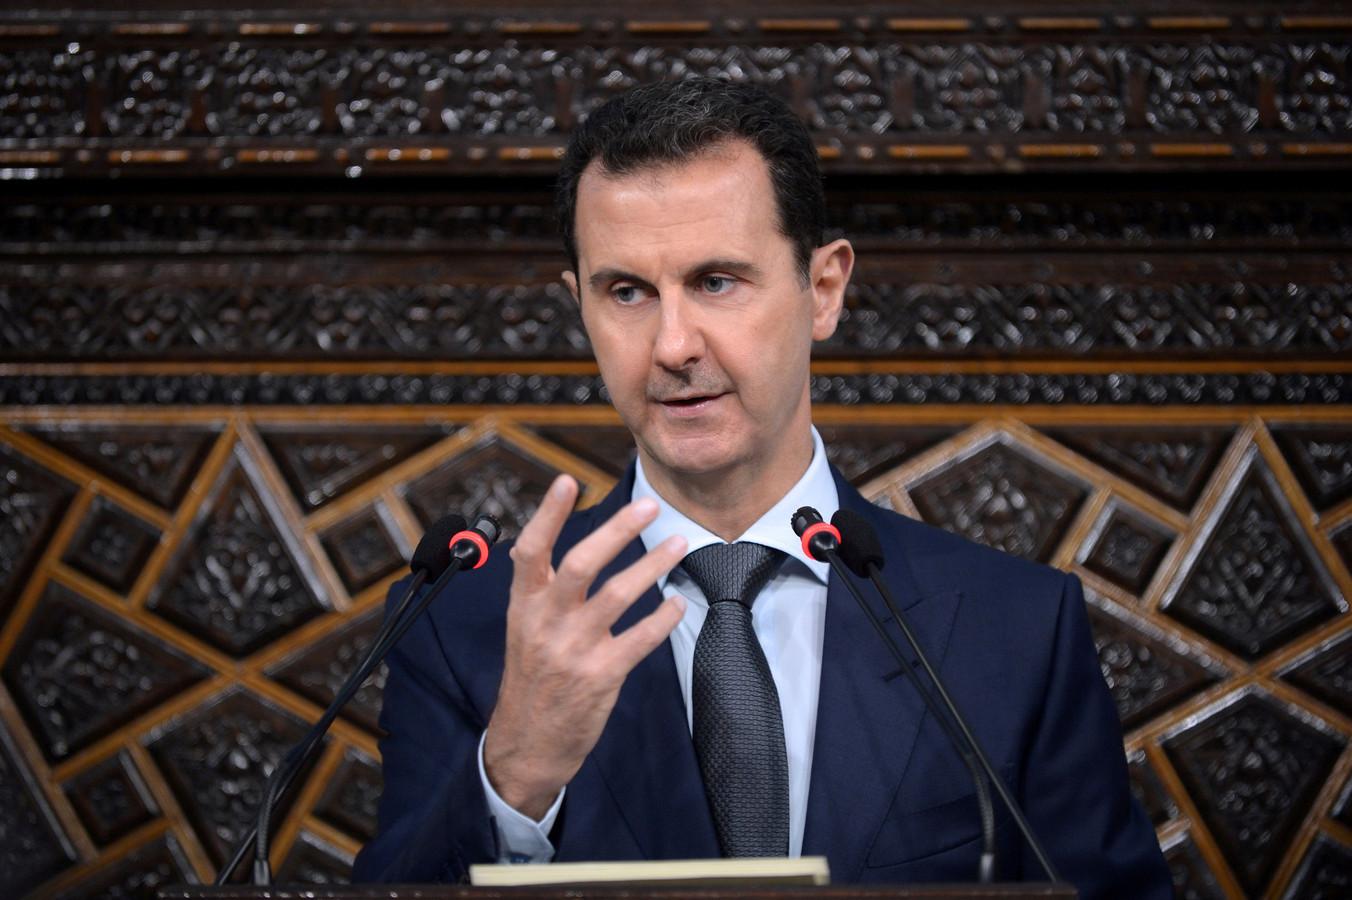 De Syrische president Bashar al-Assad.